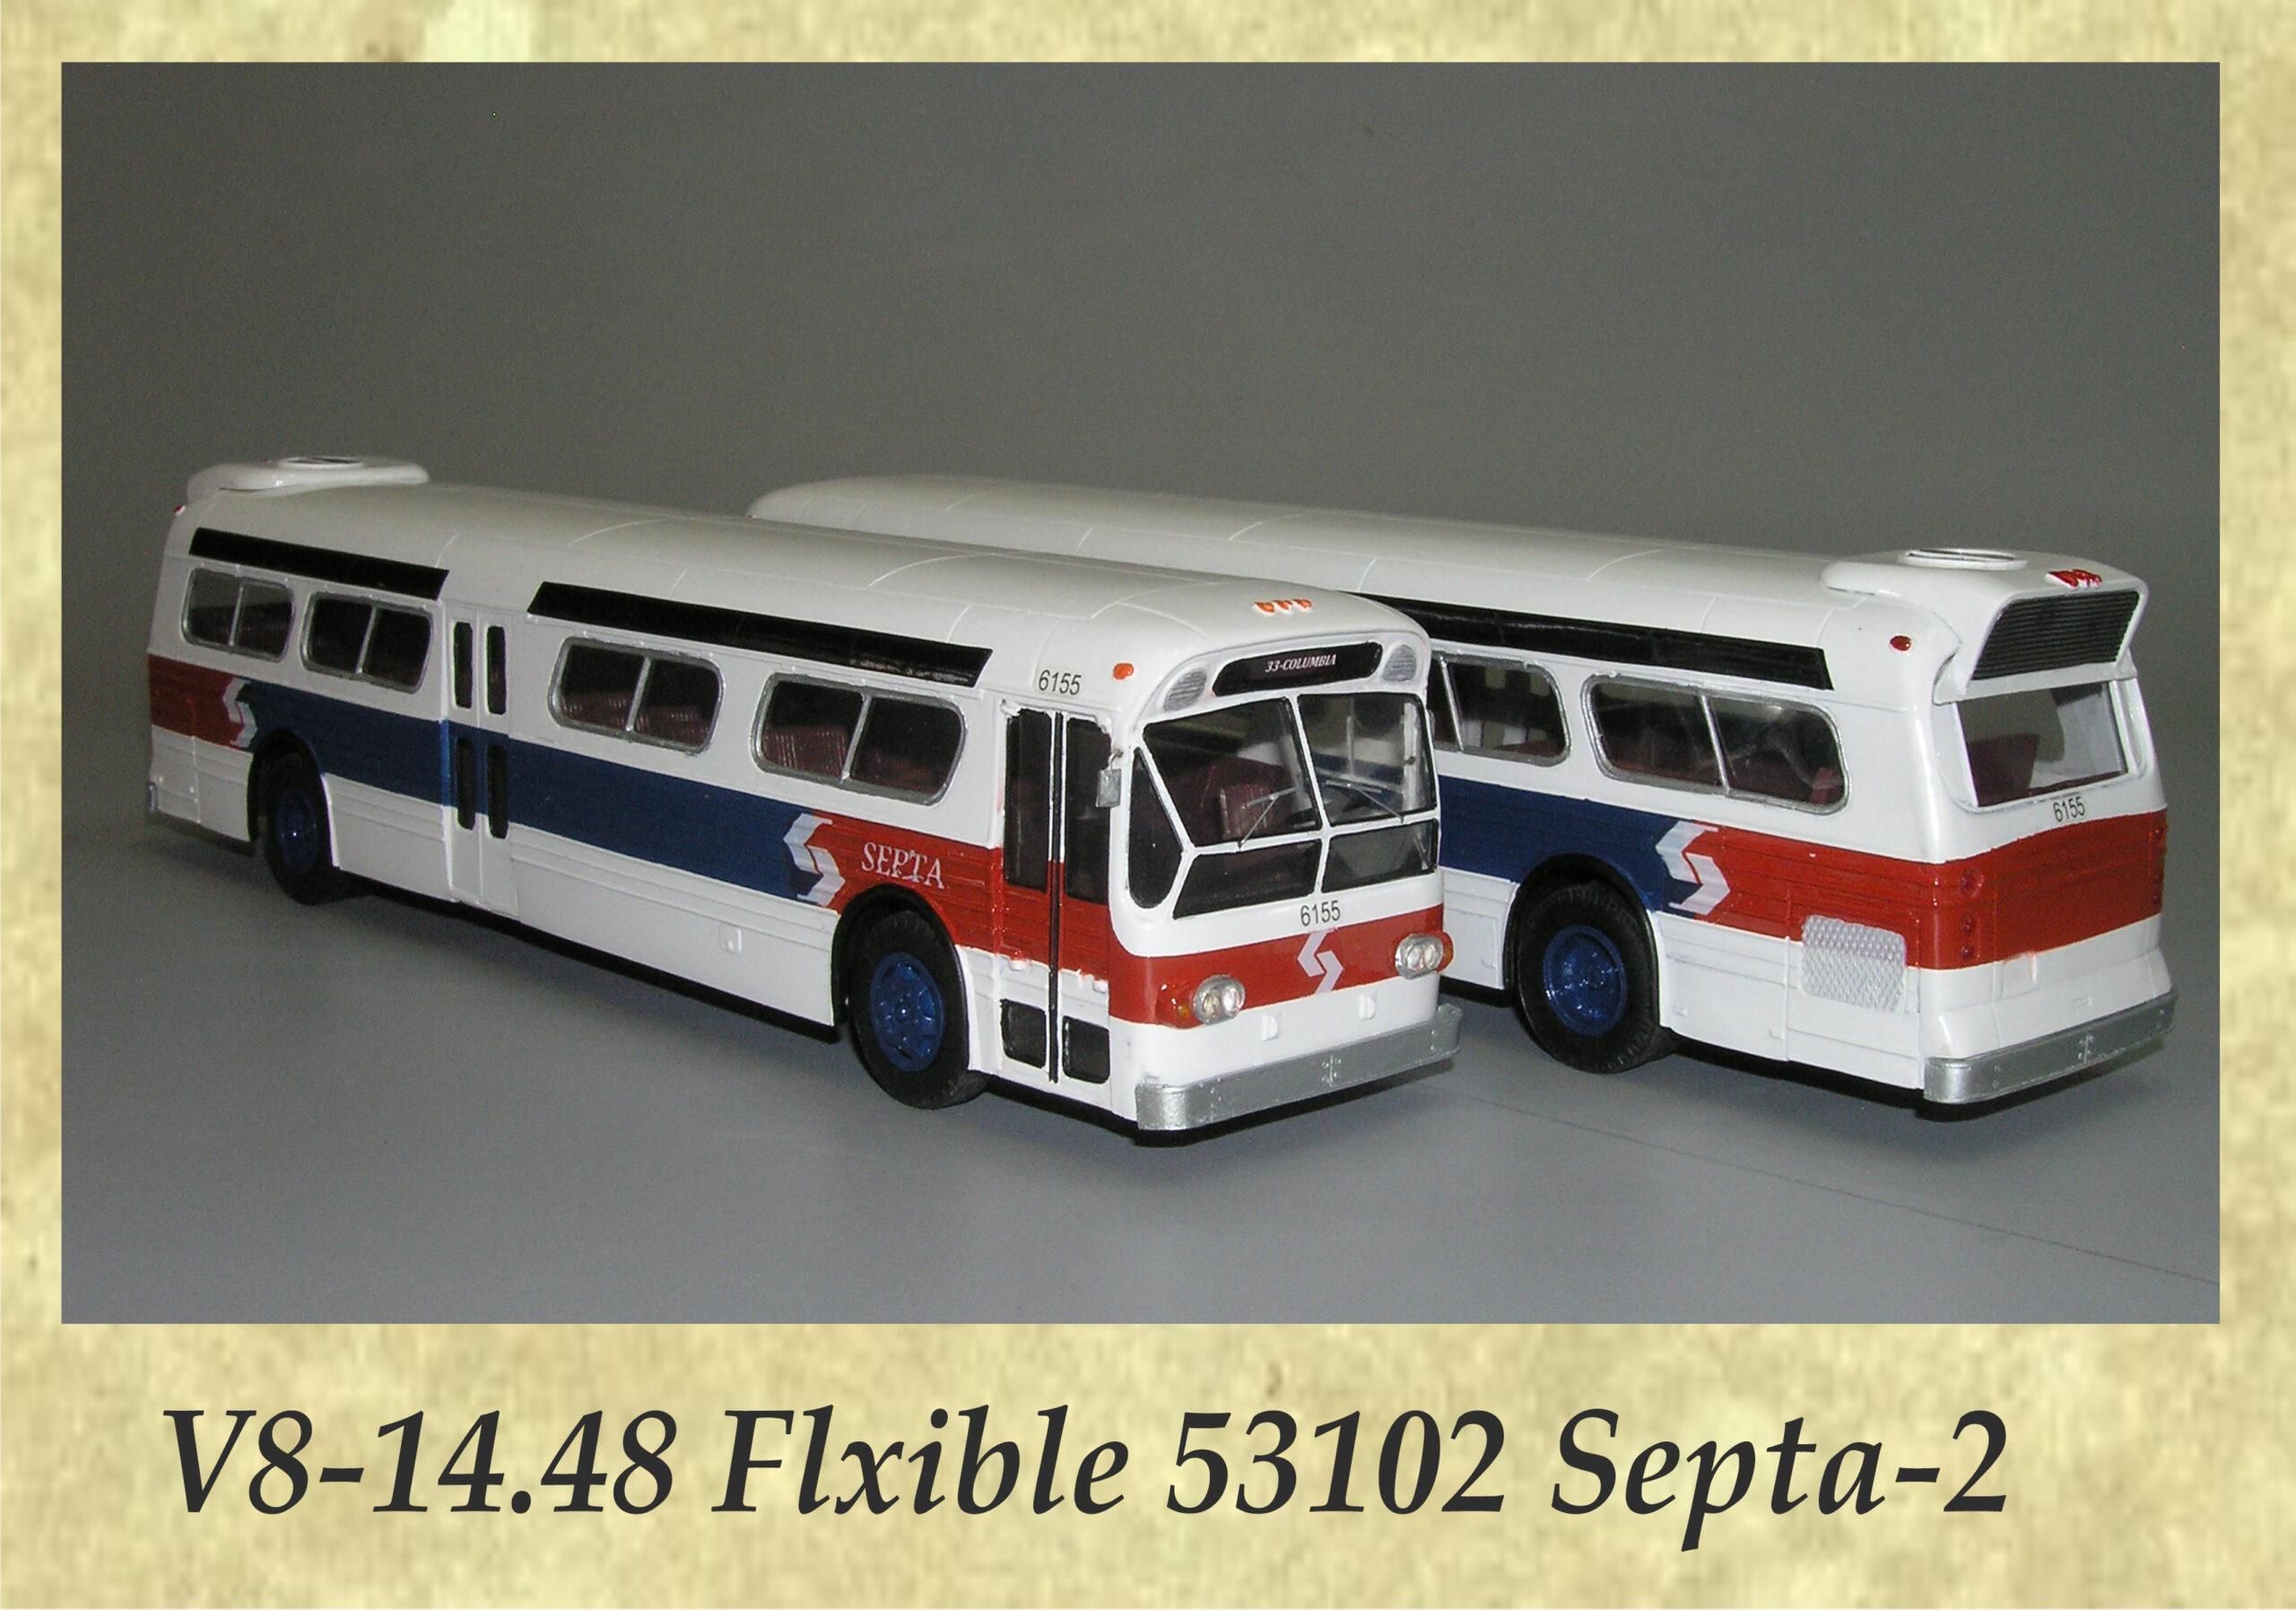 V8-14.48 Flxible 53102 Septa-2